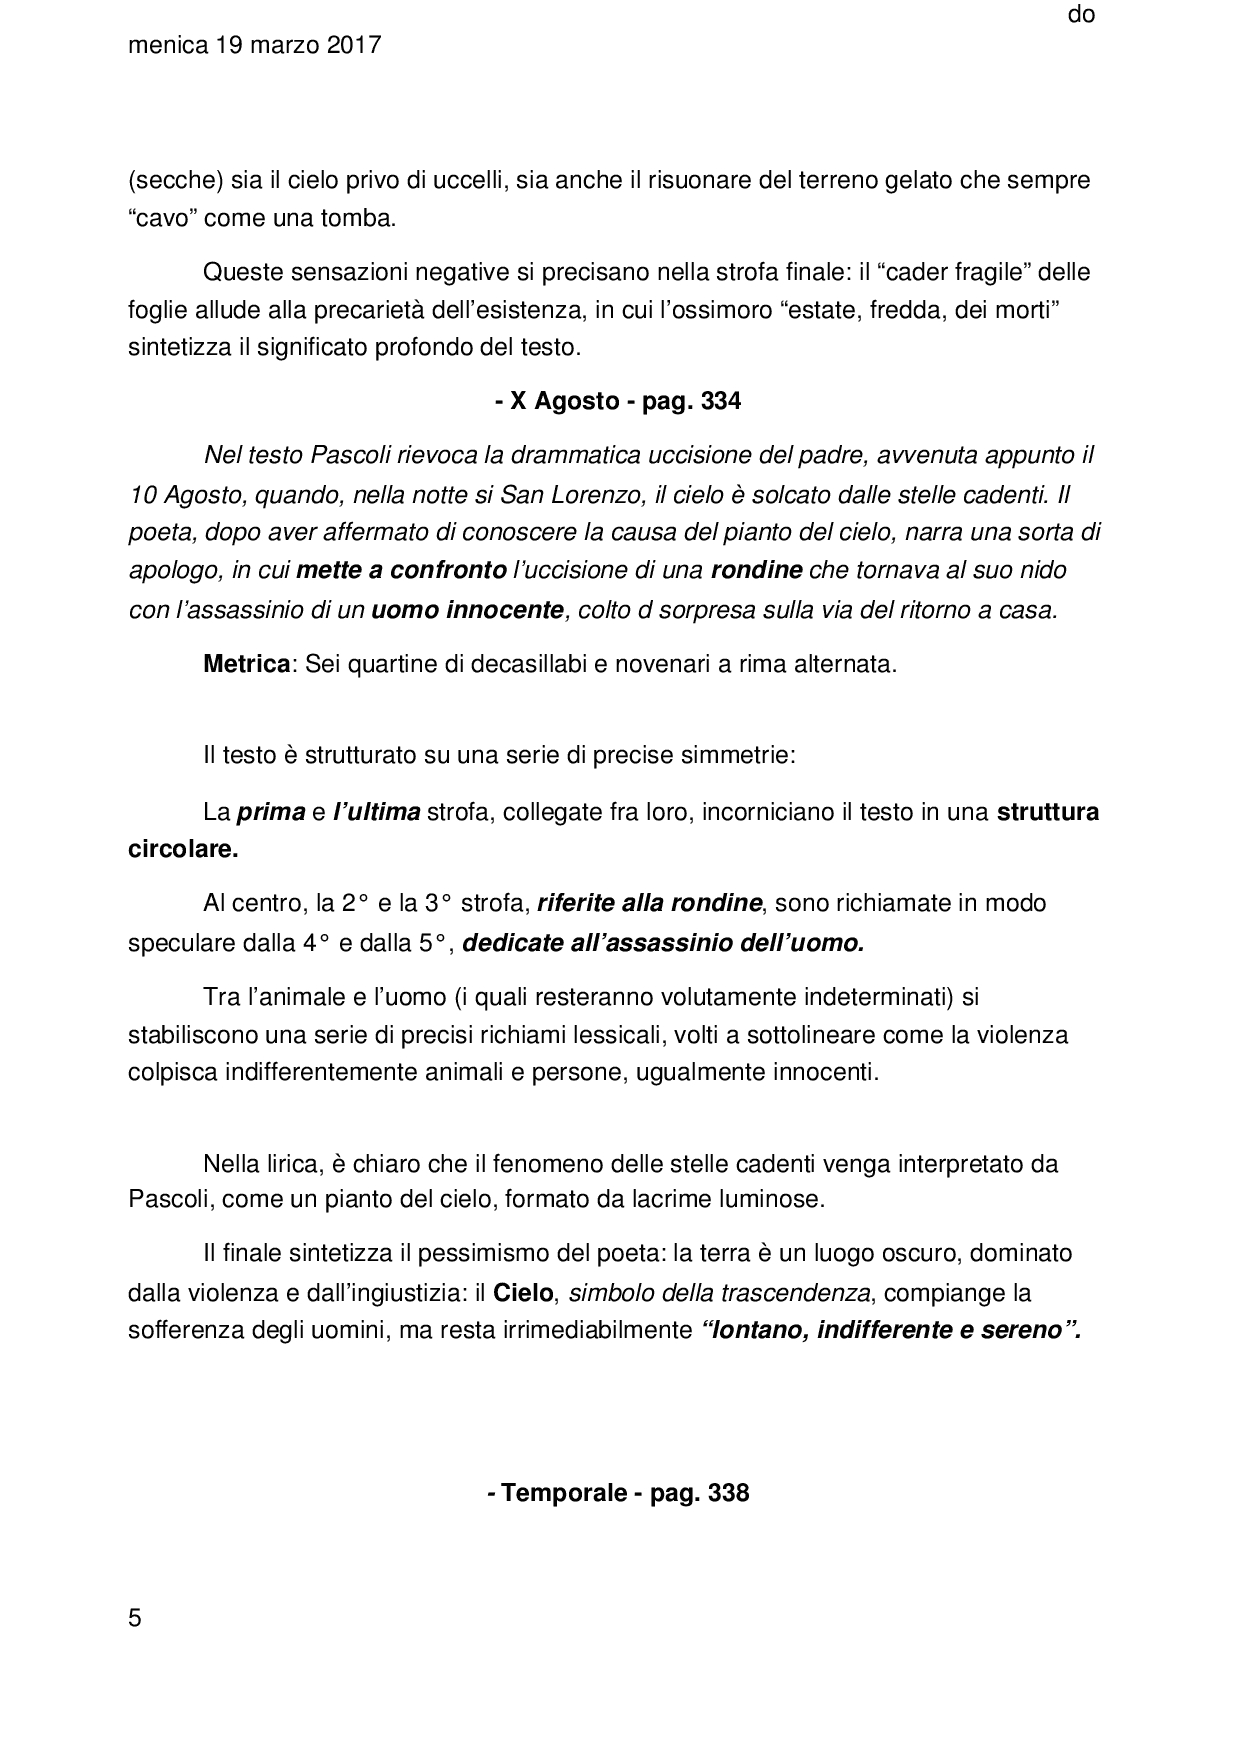 Le Opere Di Pascoli, Sintesi, Metrica E Commento - Docsity tout Docsity